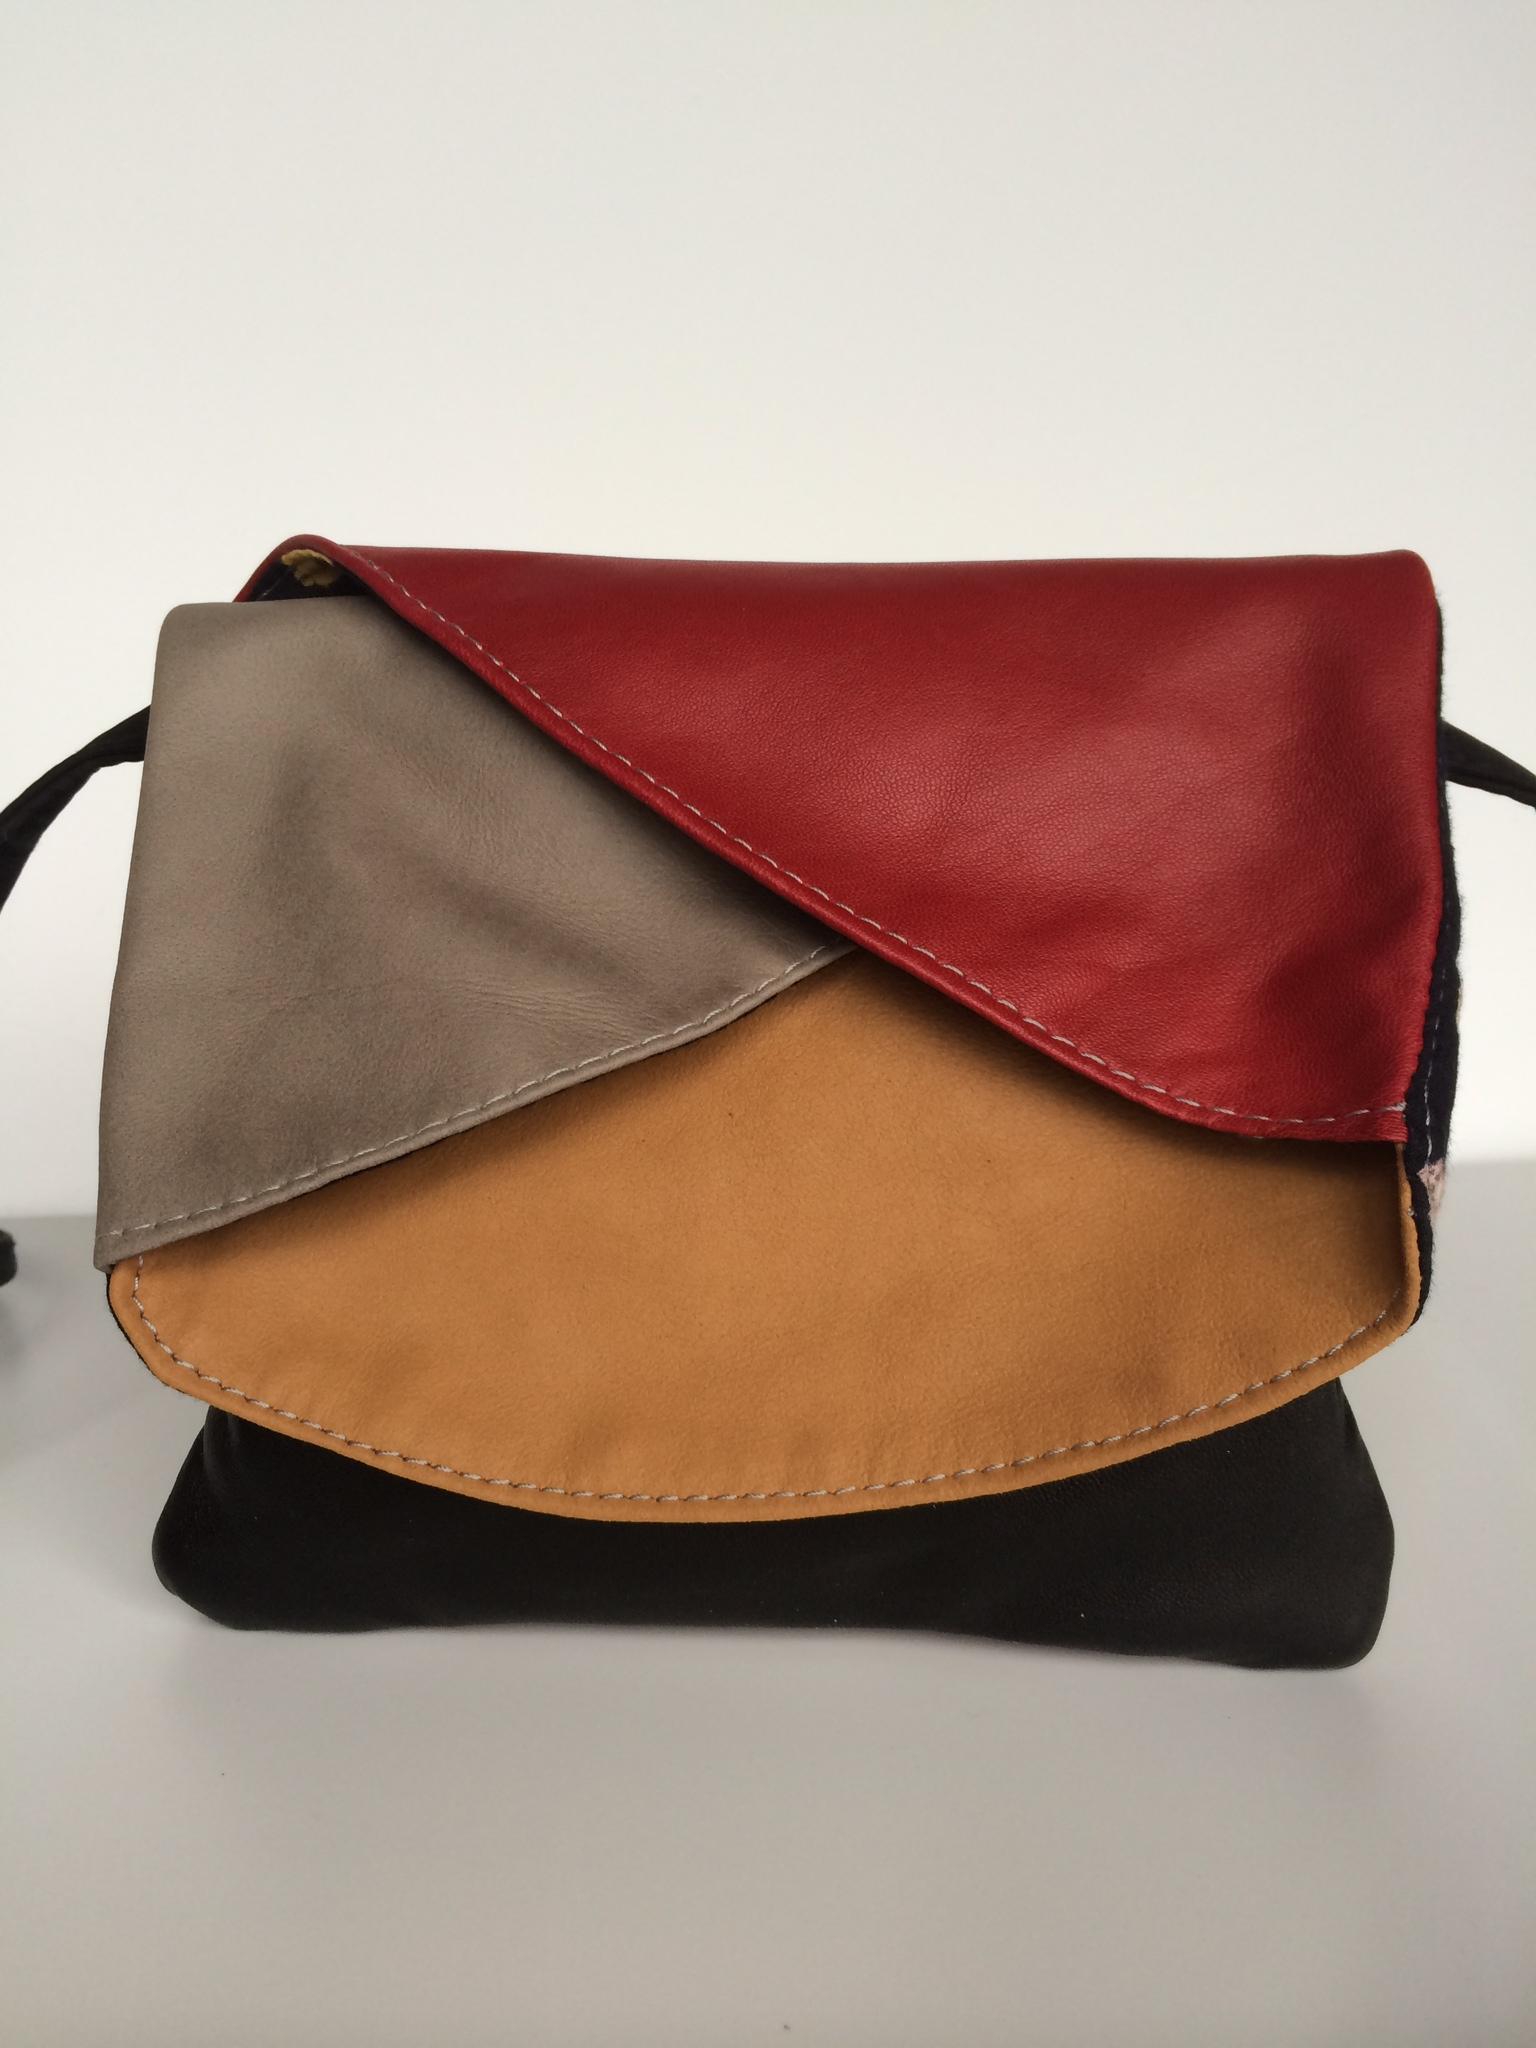 Aya Leather Four Pocket Crossbody